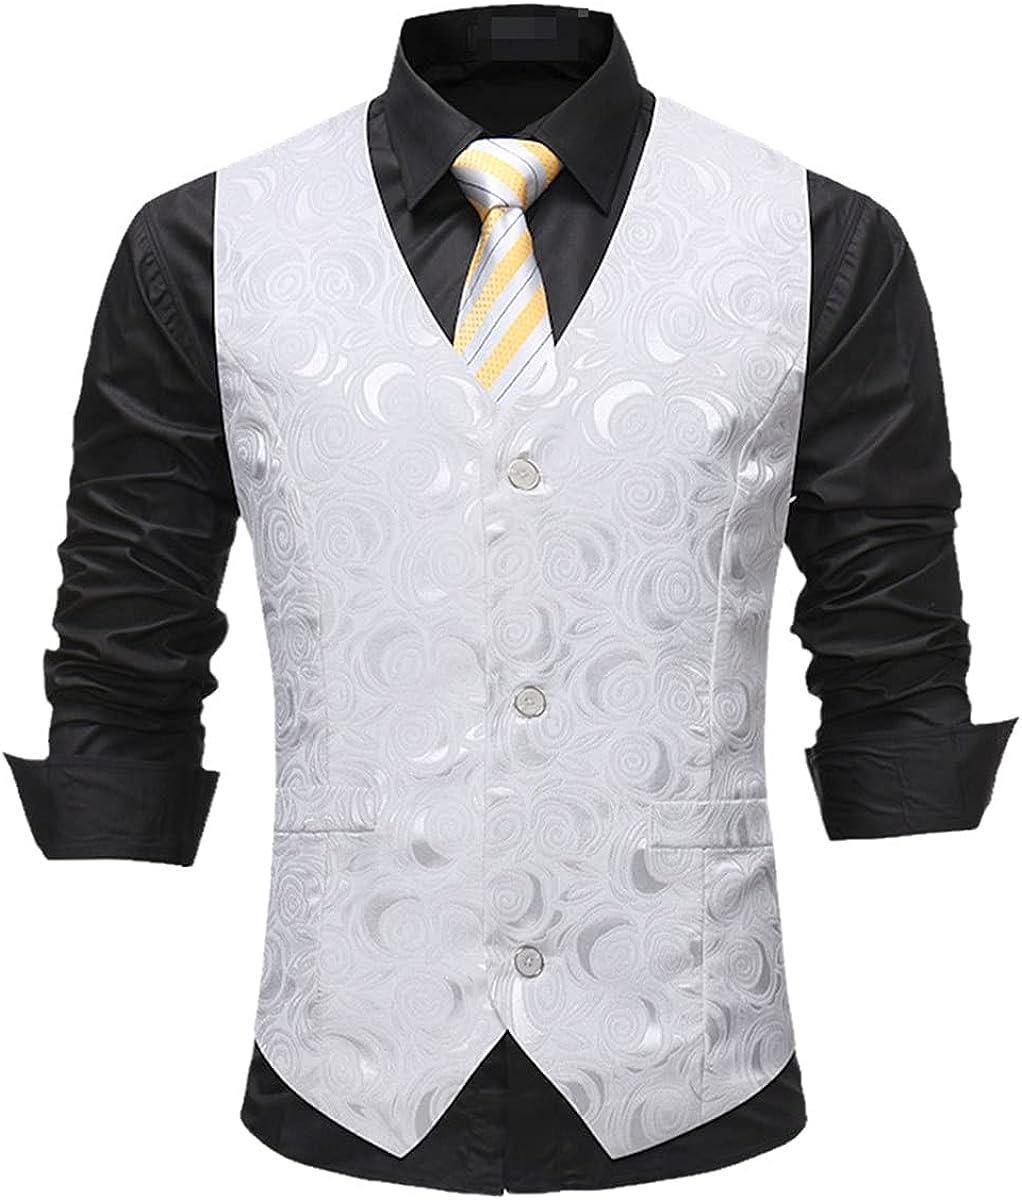 Men's gentleman white single-breasted suit vest fashion rose print wedding vest business tuxedo vest